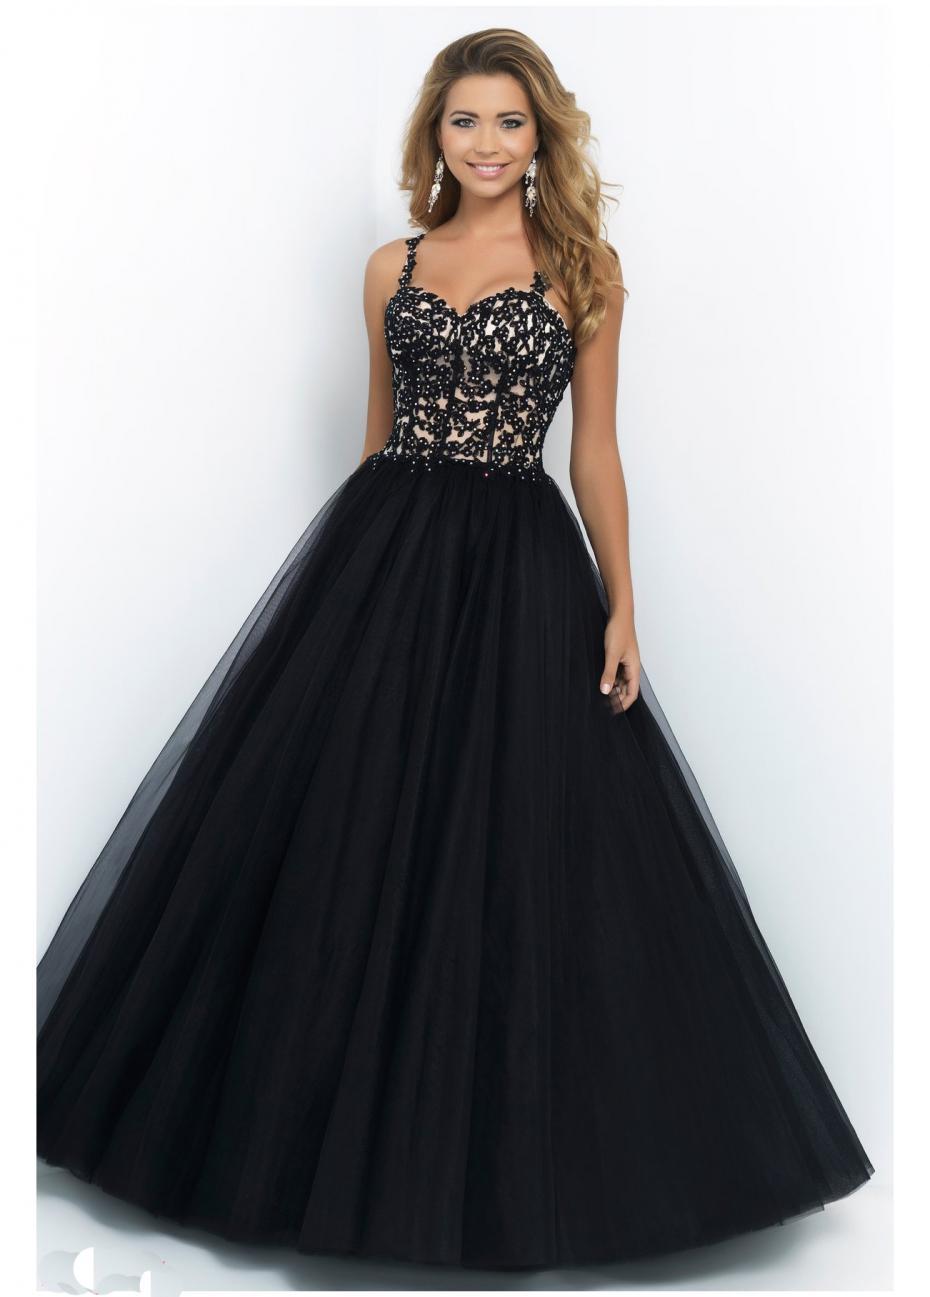 Get Quotations · Spaghetti Straps Sweetheart Black Tulle Beading Formal Long  Puffy Fluffy Prom Dresses Vestido Longo De Formatura 982a0143d86e